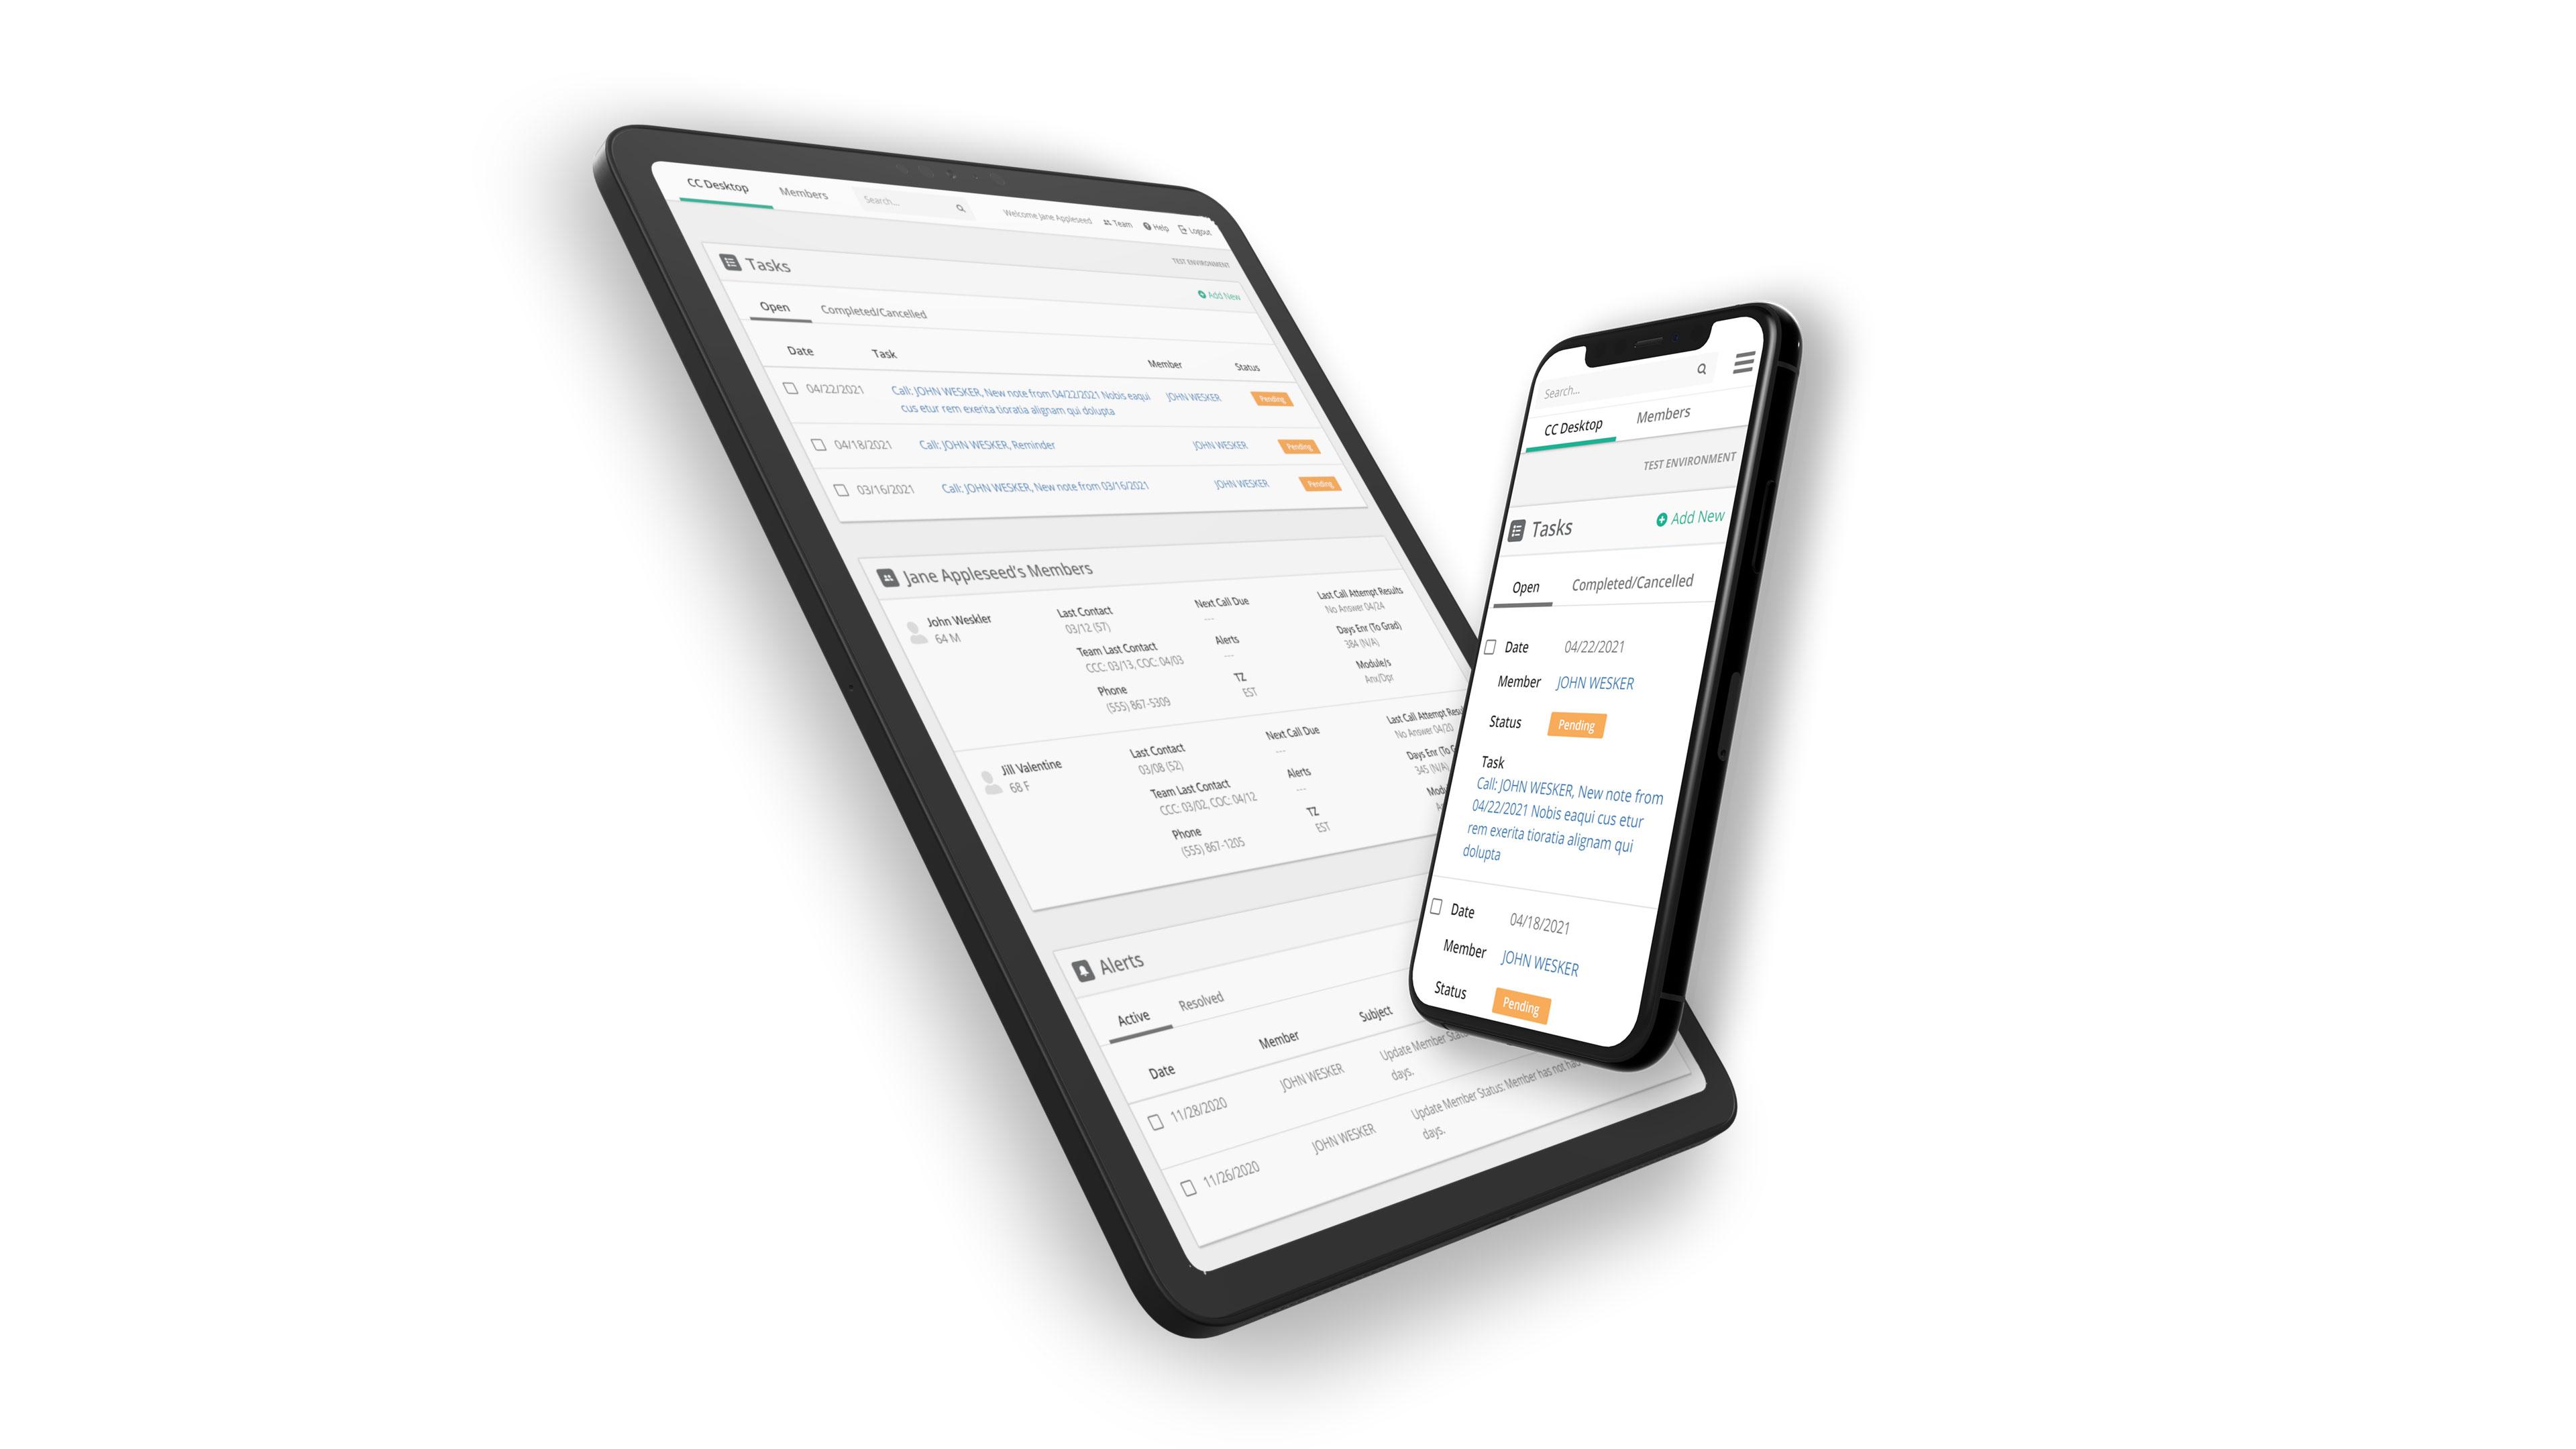 iPad & iPhone showcasing screenshots of the CRM software.